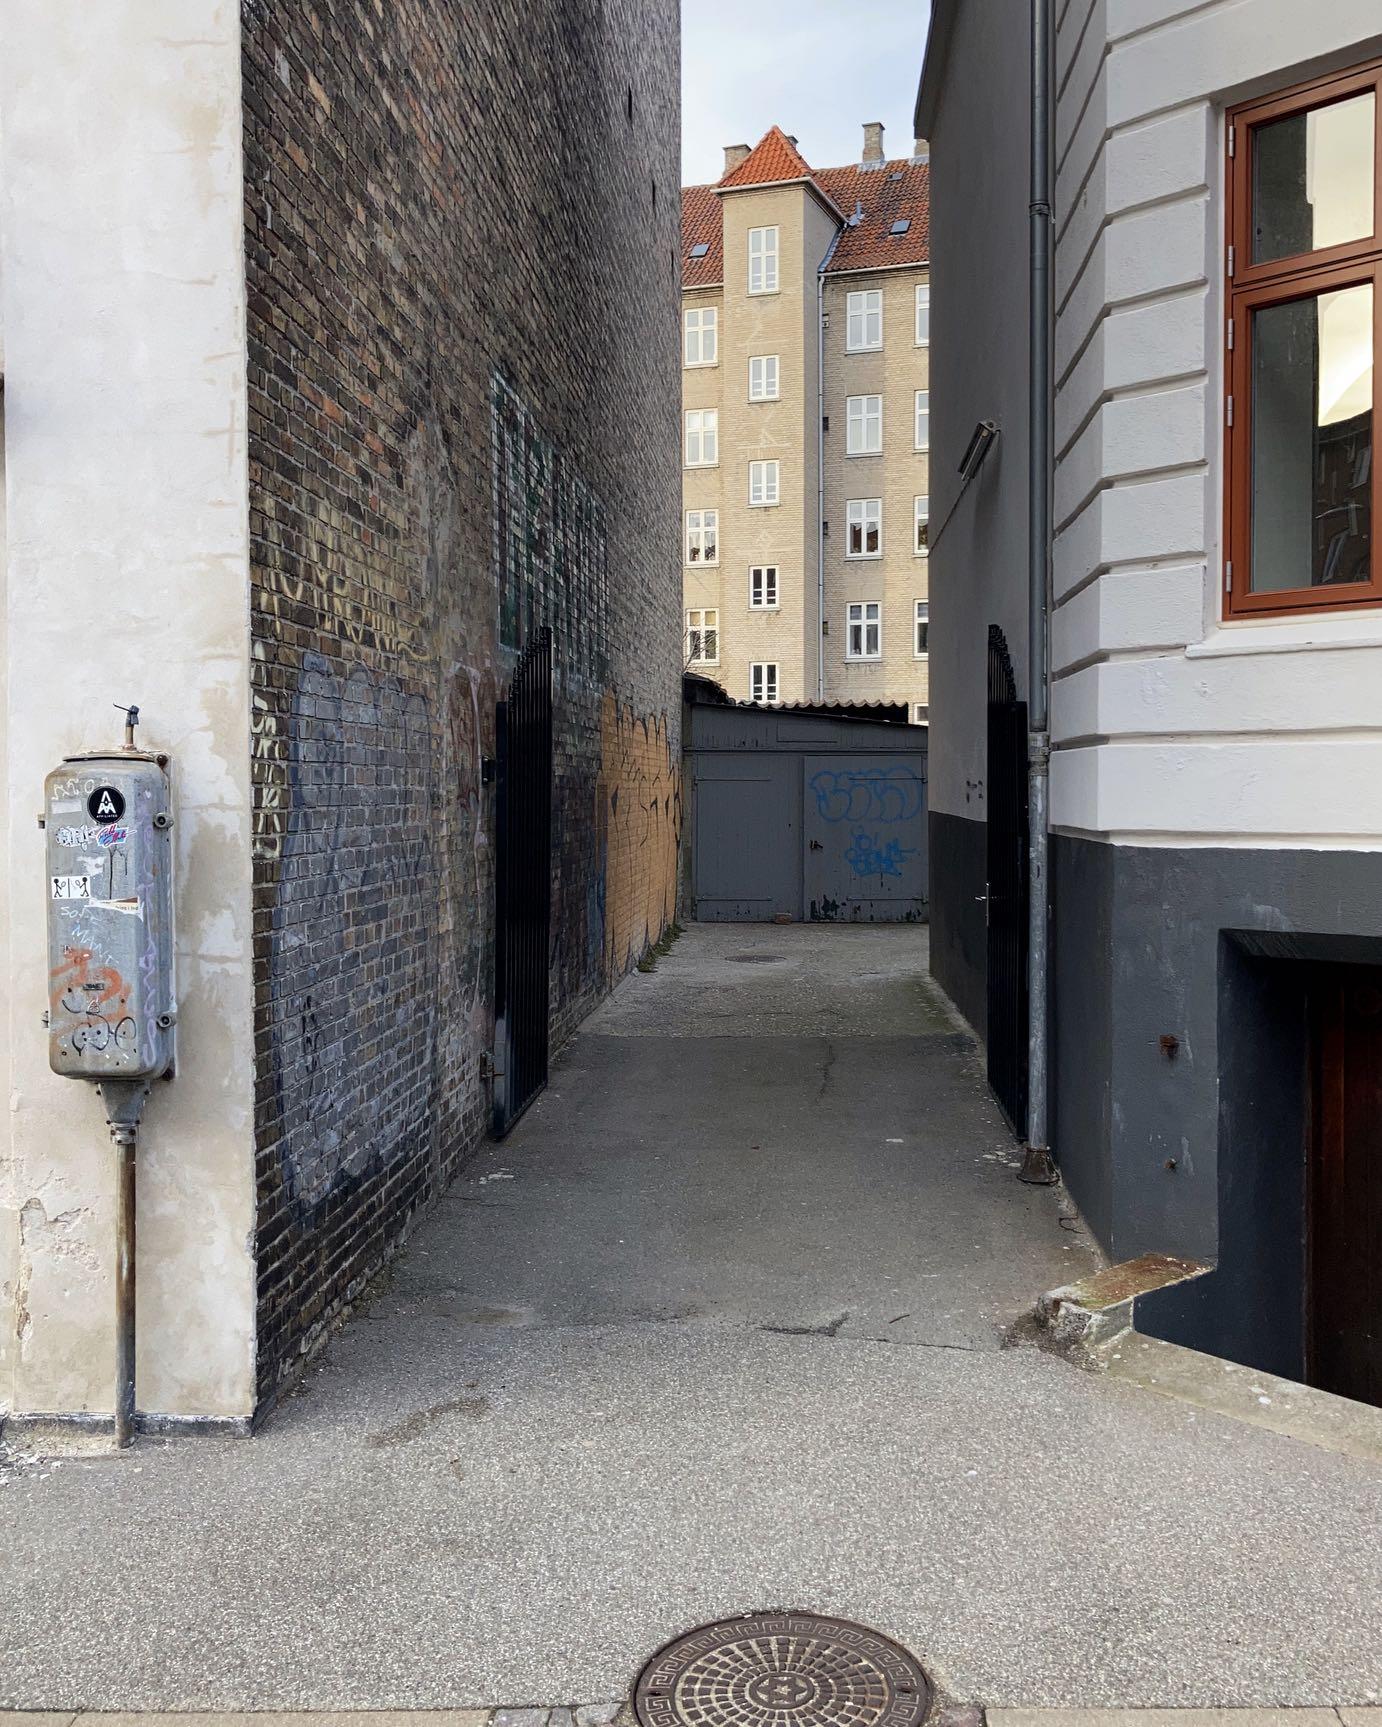 Hammershøi colours. Hammershøi shapes. Hammershøi mood. An alleyway.